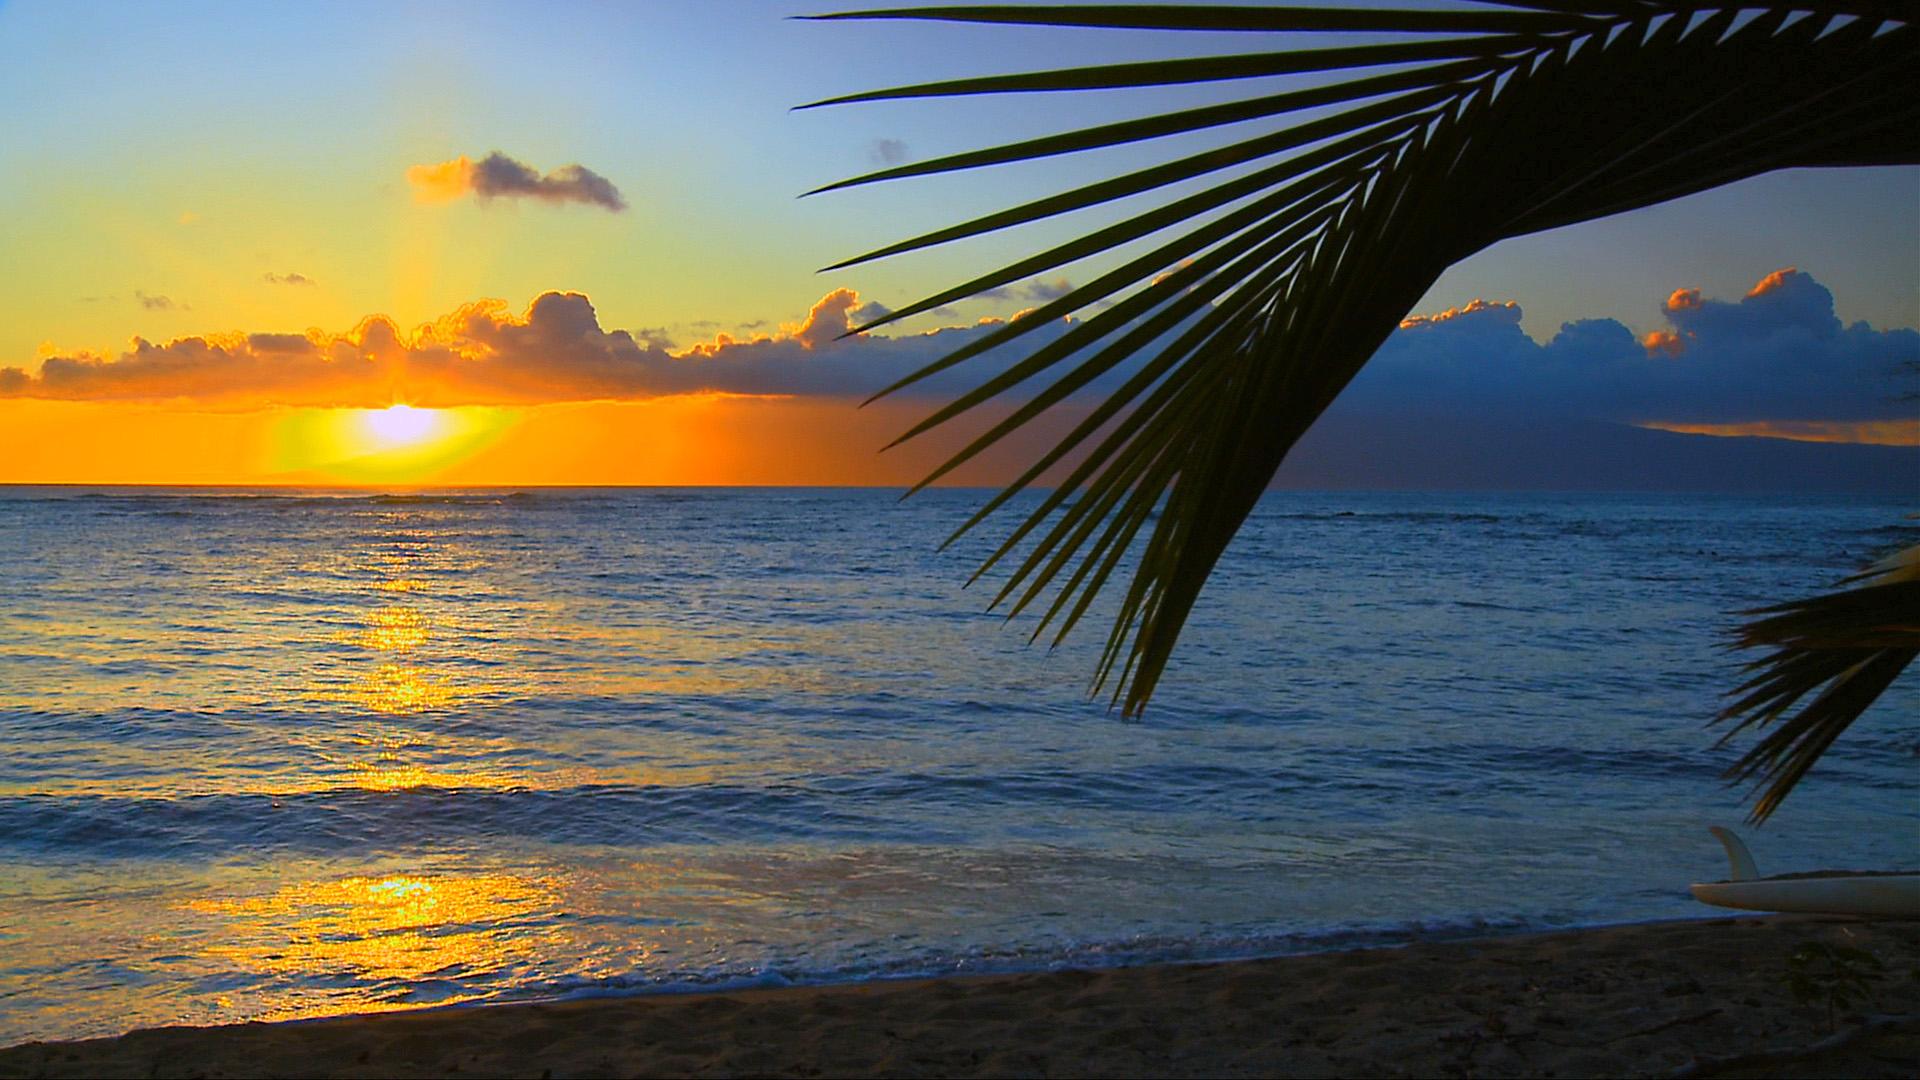 Hawaii Beaches wallpaper - 5463